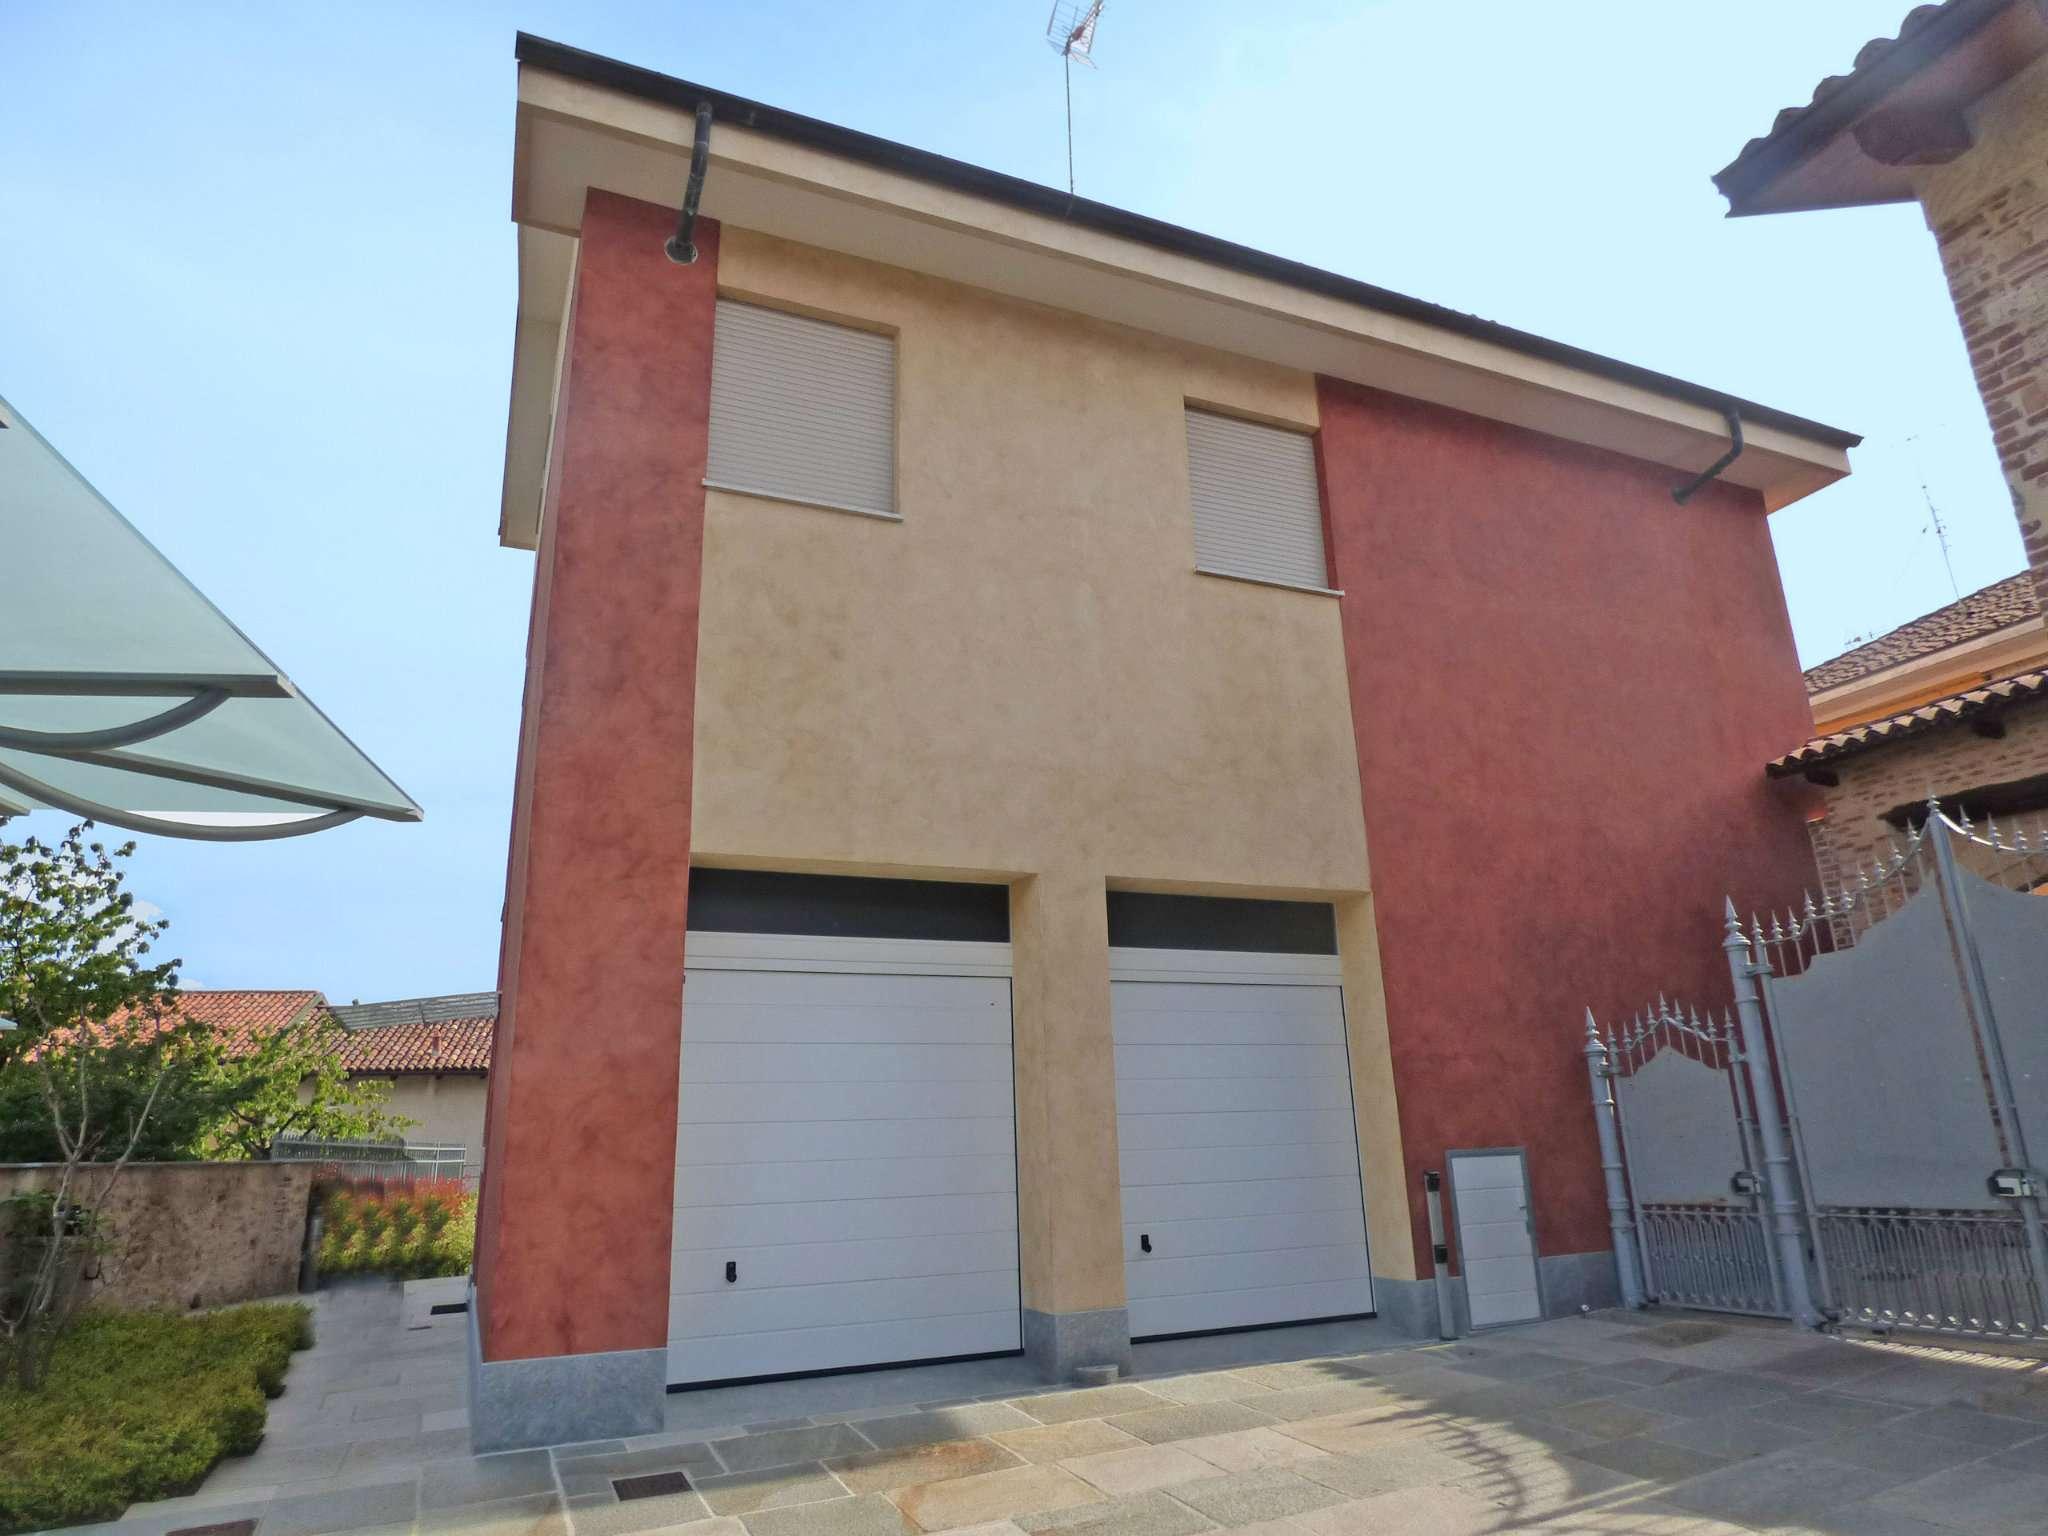 Bilocale Pecetto Torinese Via Umberto I 10